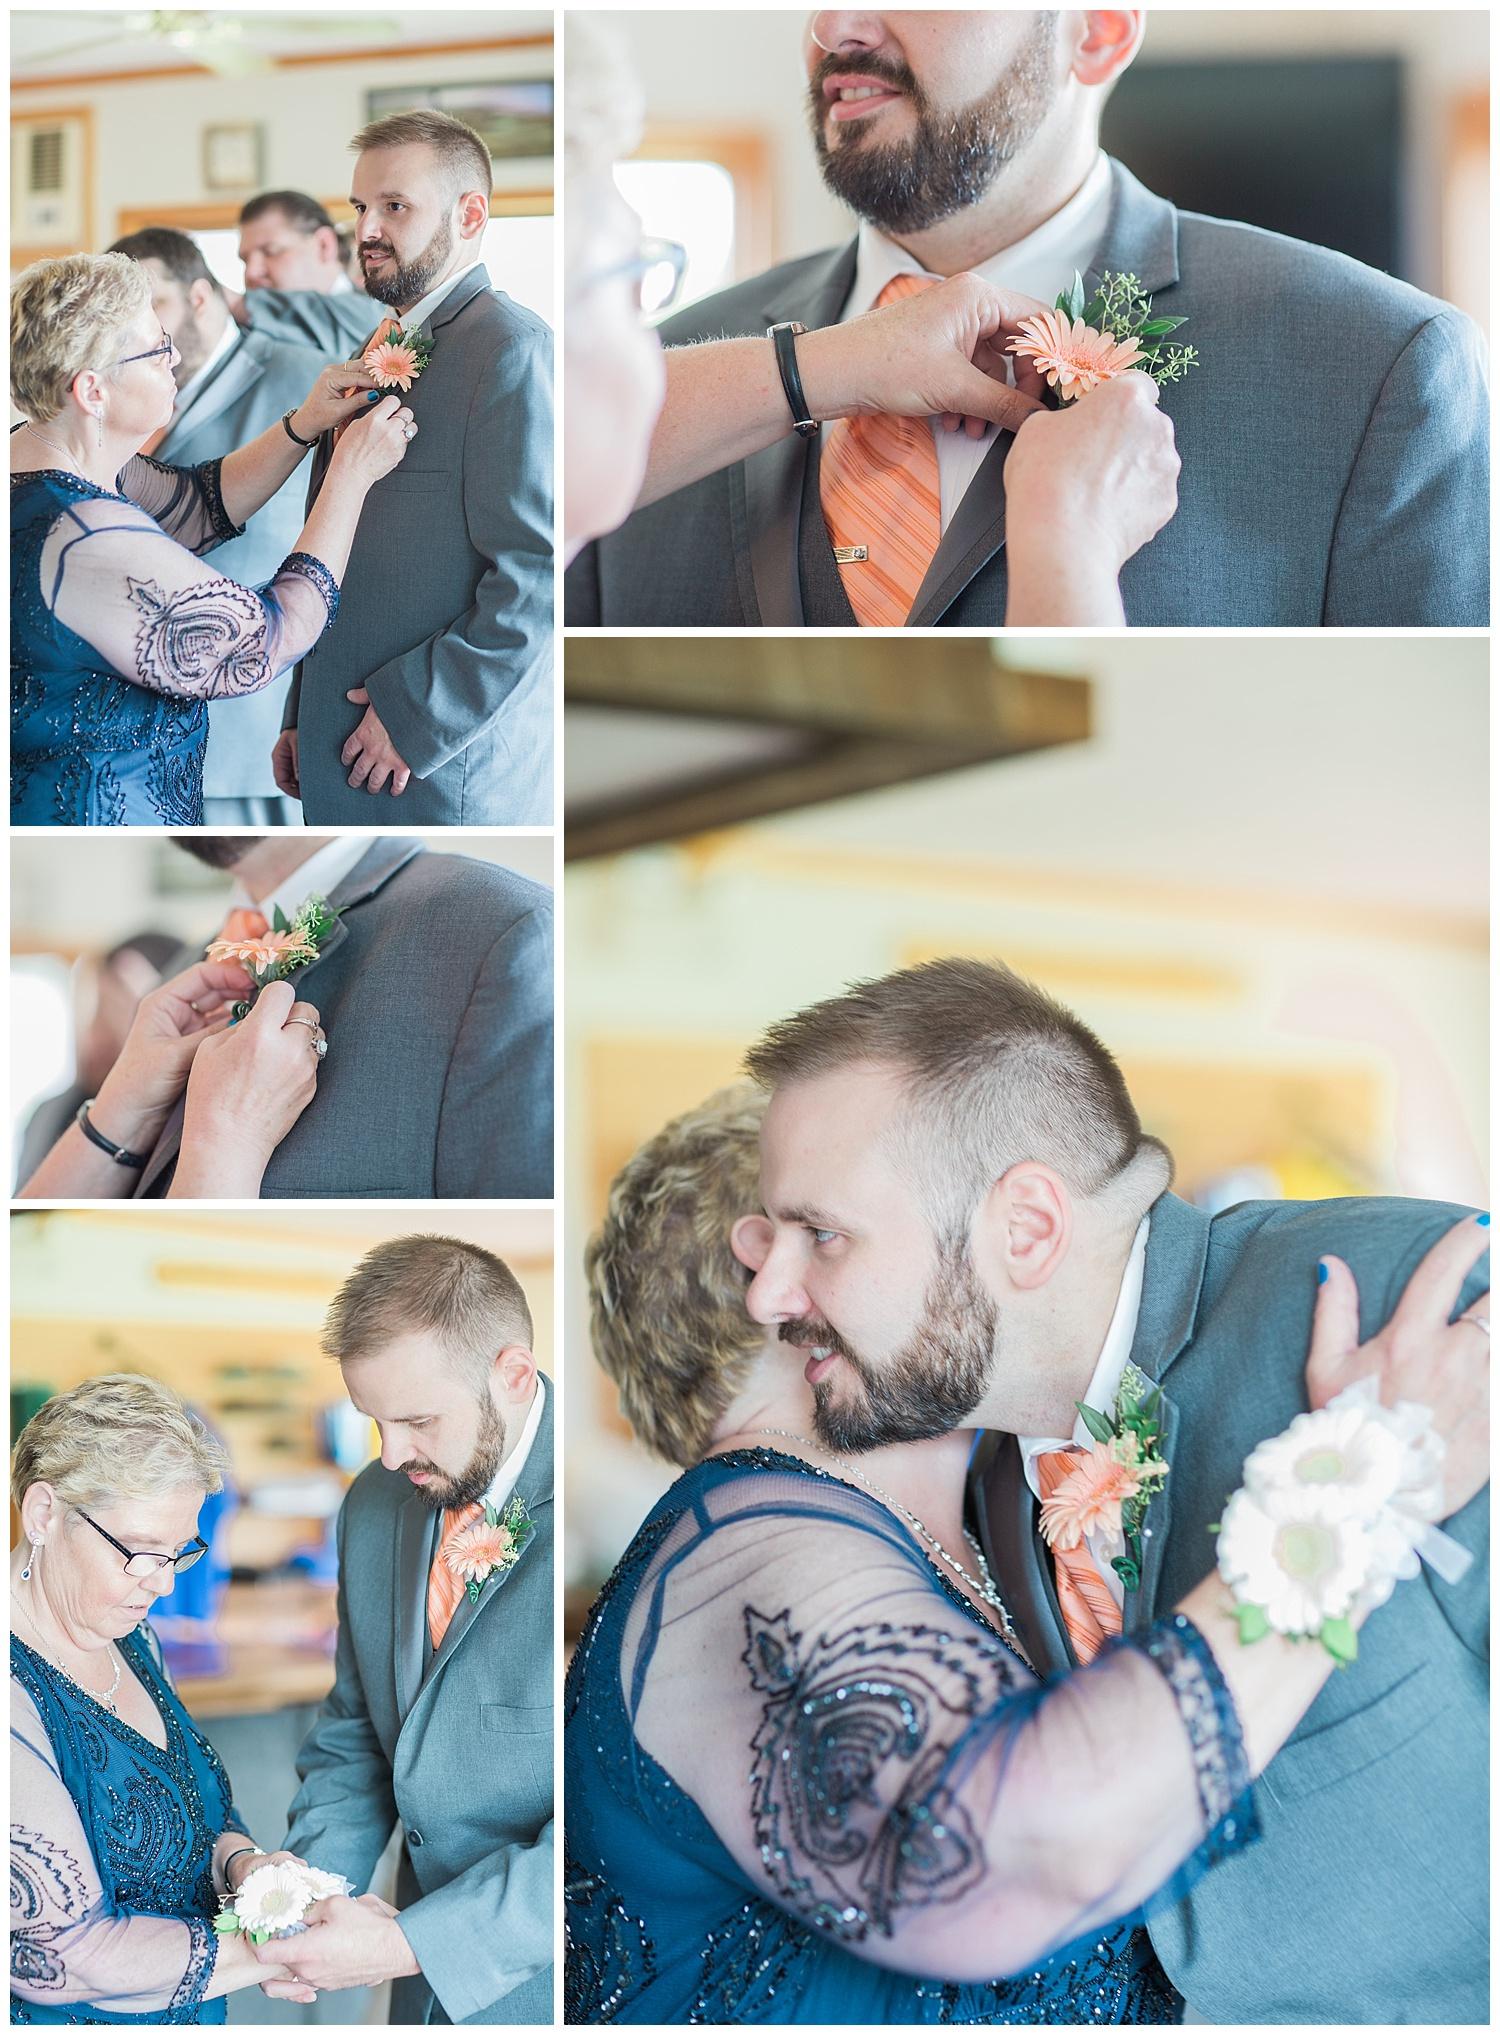 Brian and Molly Wed in Conesus NY - Lass & Beau-102_Buffalo wedding photography.jpg